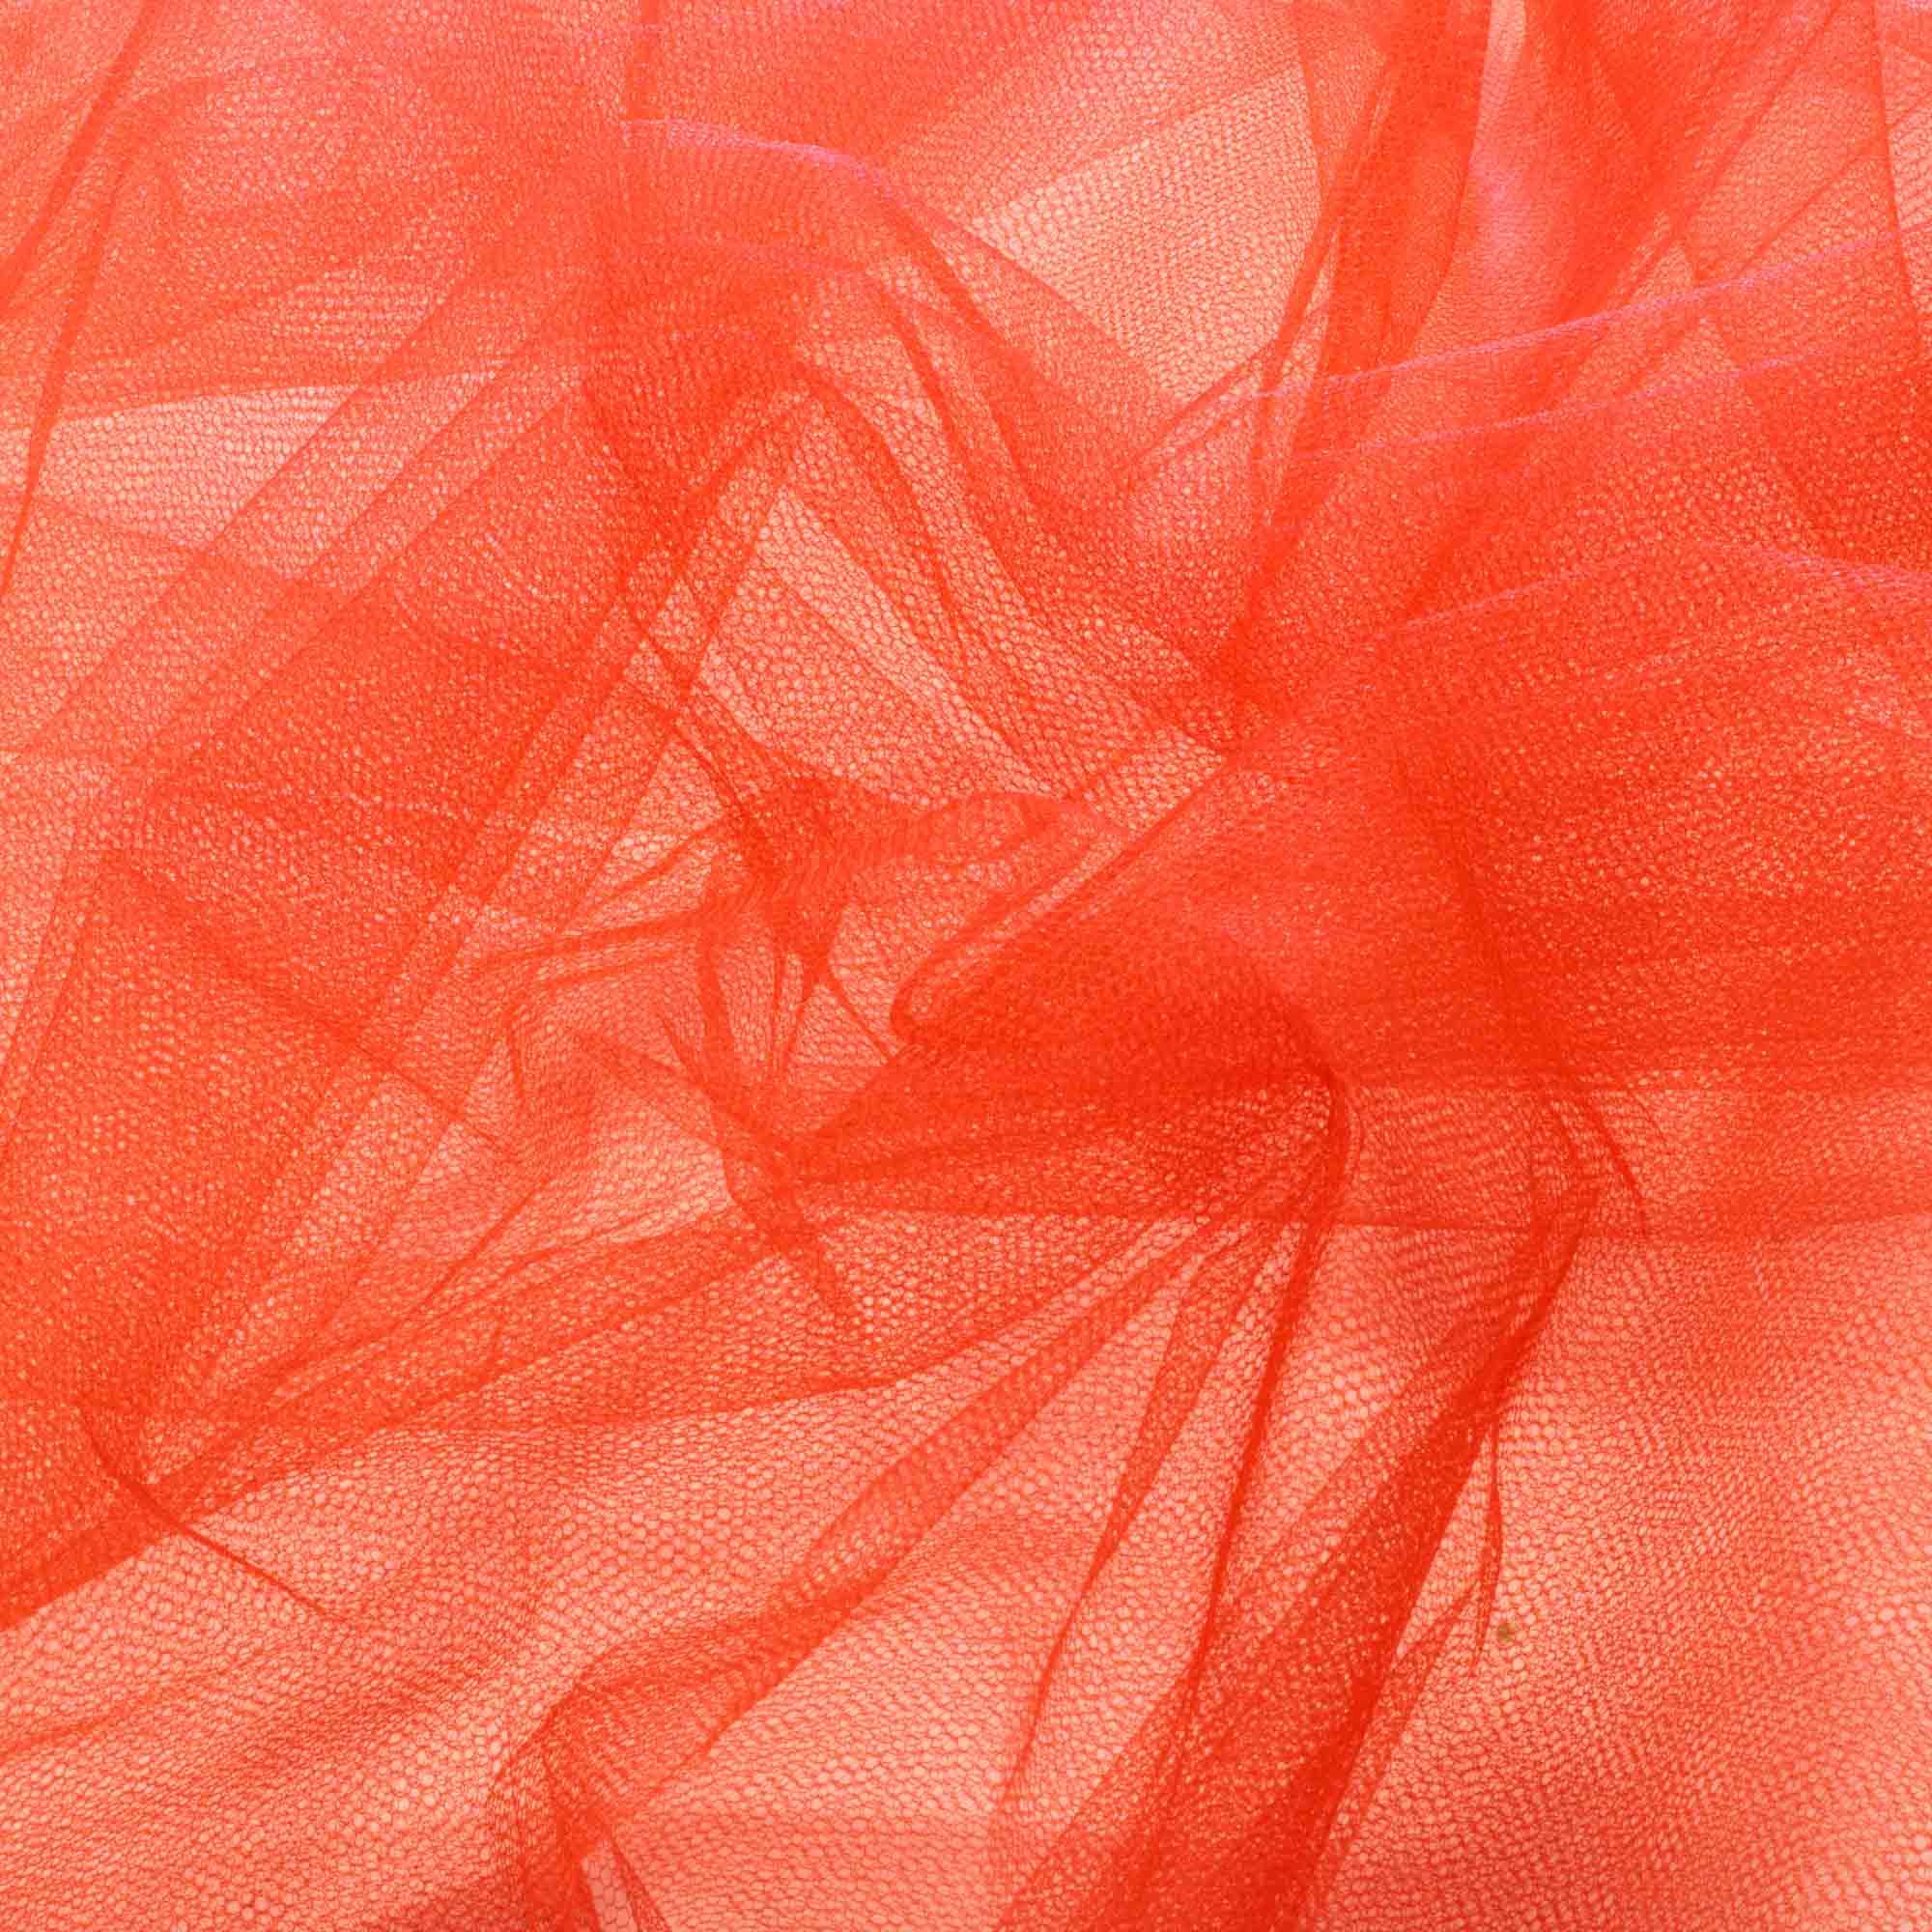 Tecido Tule 100% Poliester 1,20 Mt Largura 046  Vermelho Tomate